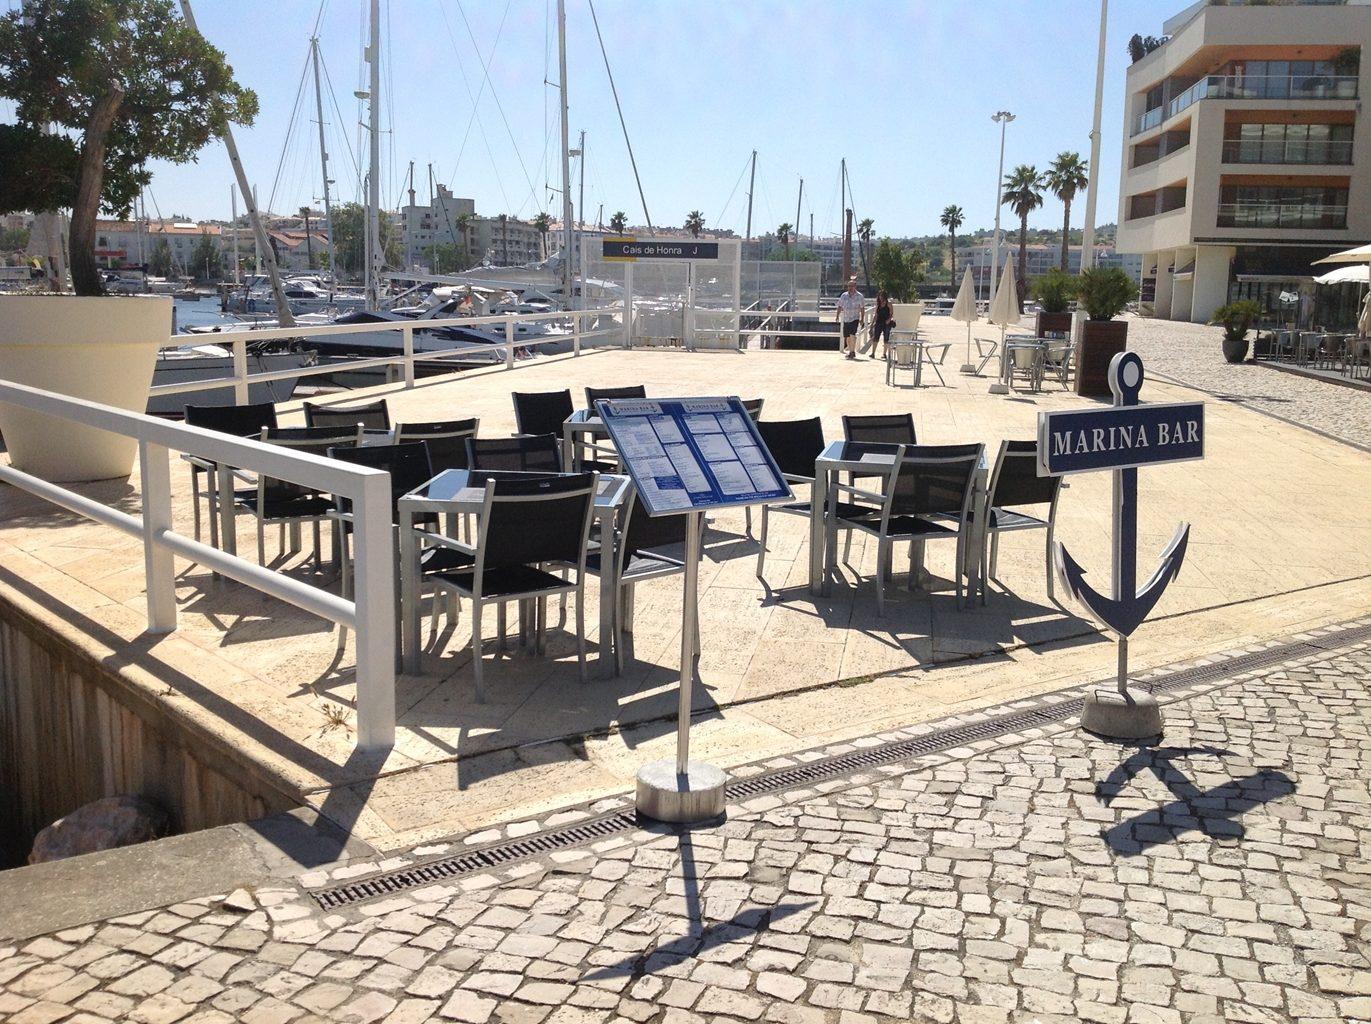 Marina Bar Lagos Bar in Lagos Portugal Outside seating with Views of the Marina Lagos Algarve 1 - Bar Lagos Algarve portugal